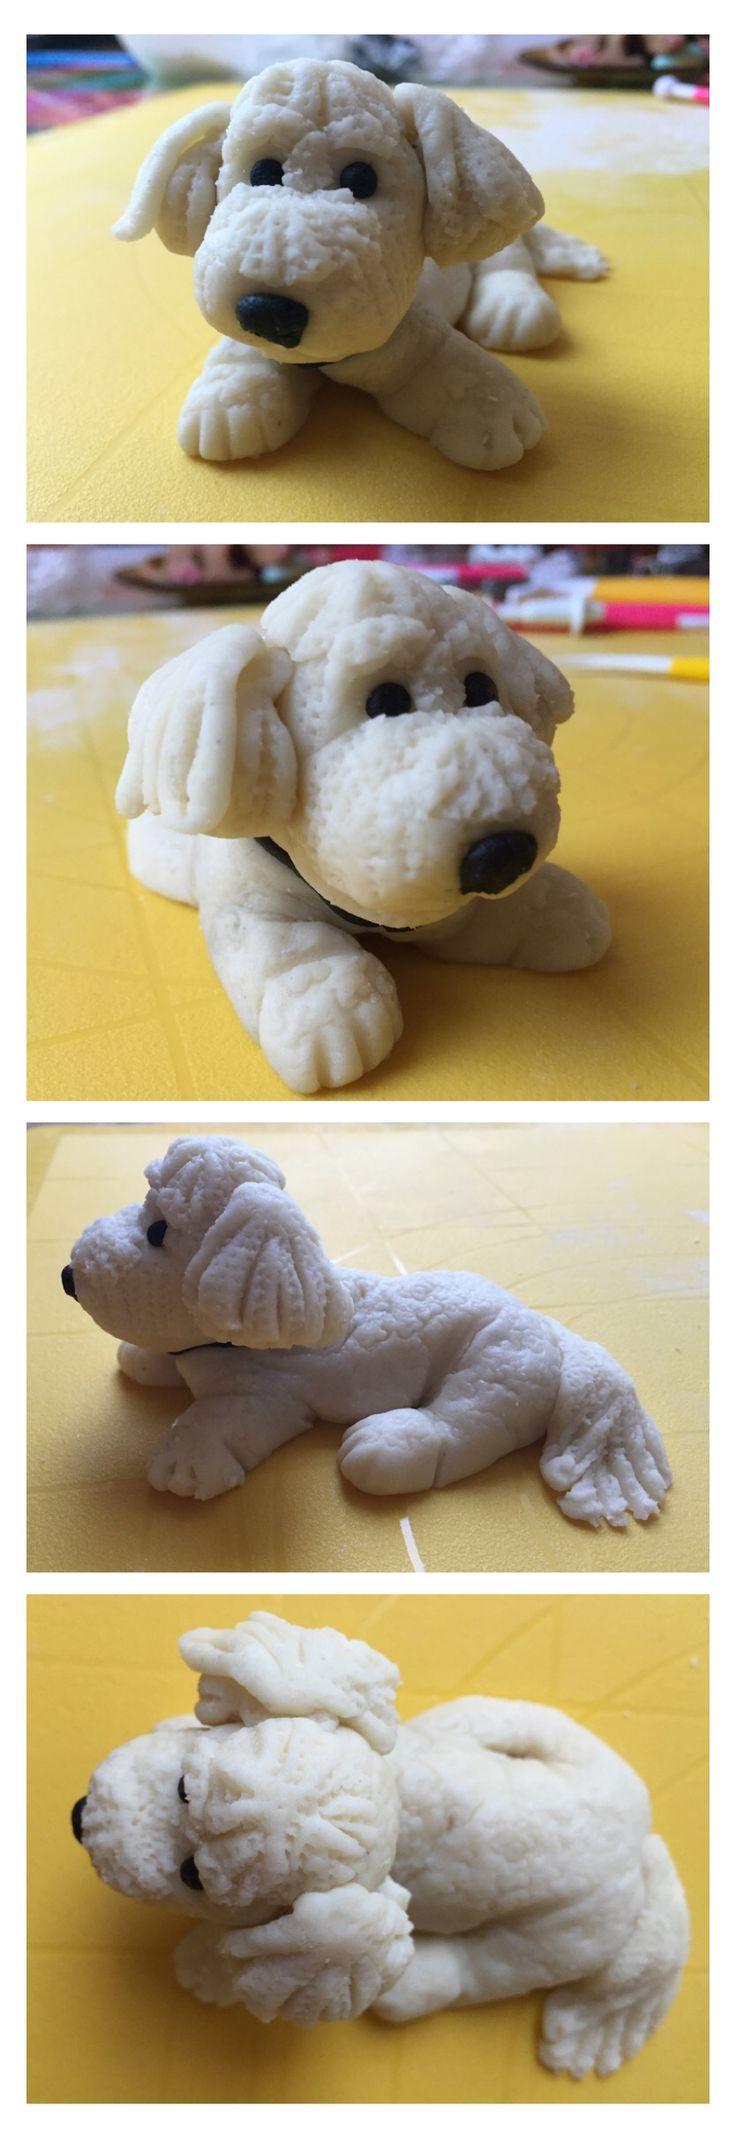 Marzipan bolognese dog